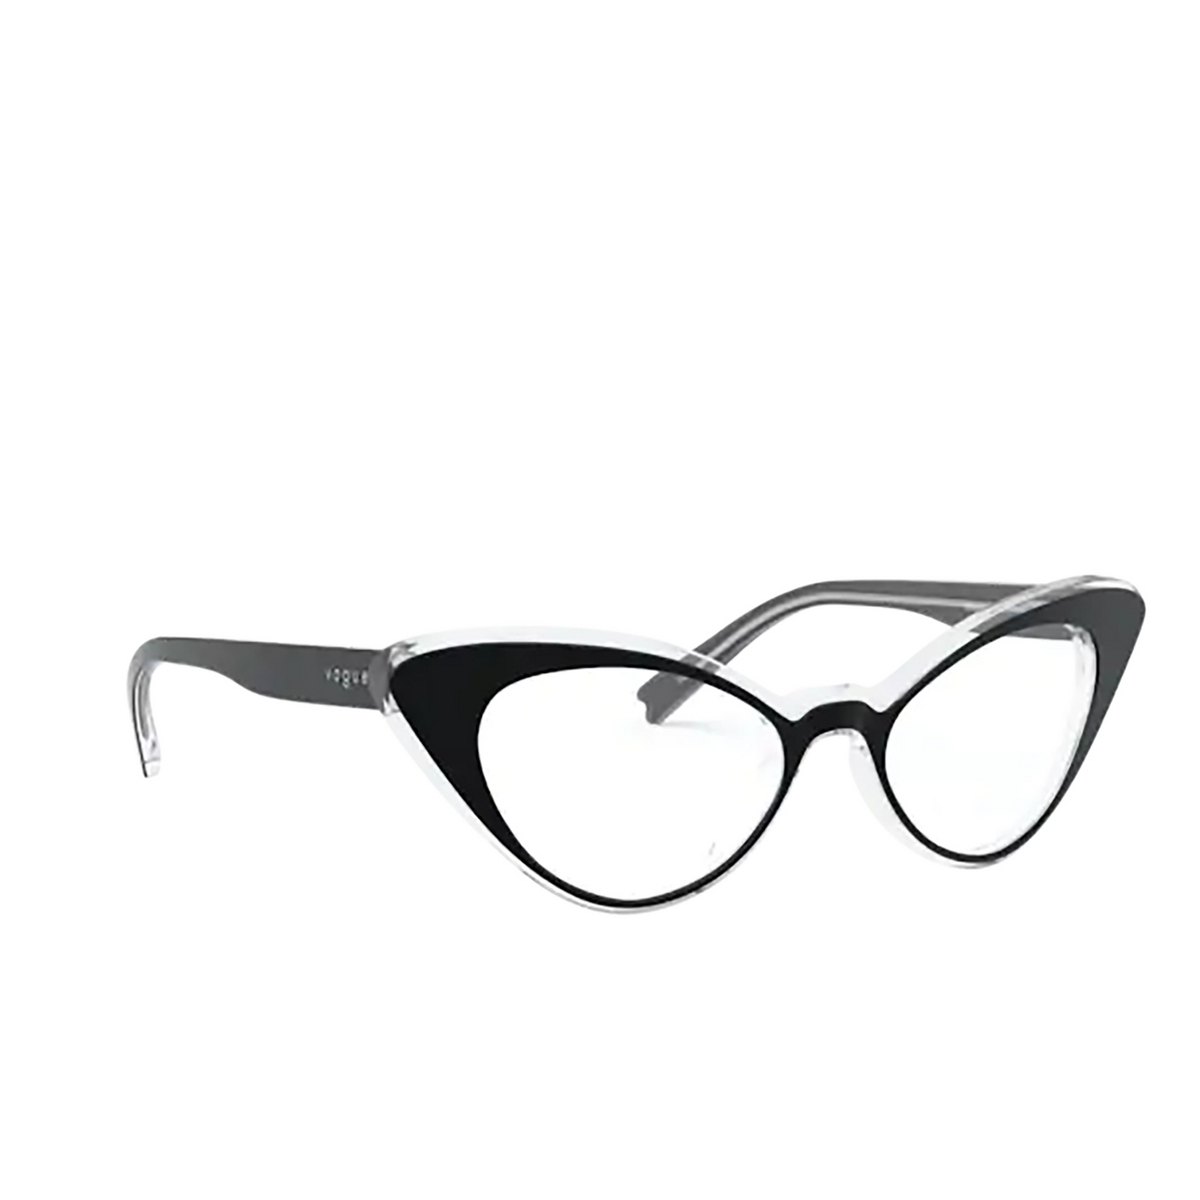 Vogue® Cat-eye Eyeglasses: VO5317 color Top Black / Crystal W827.